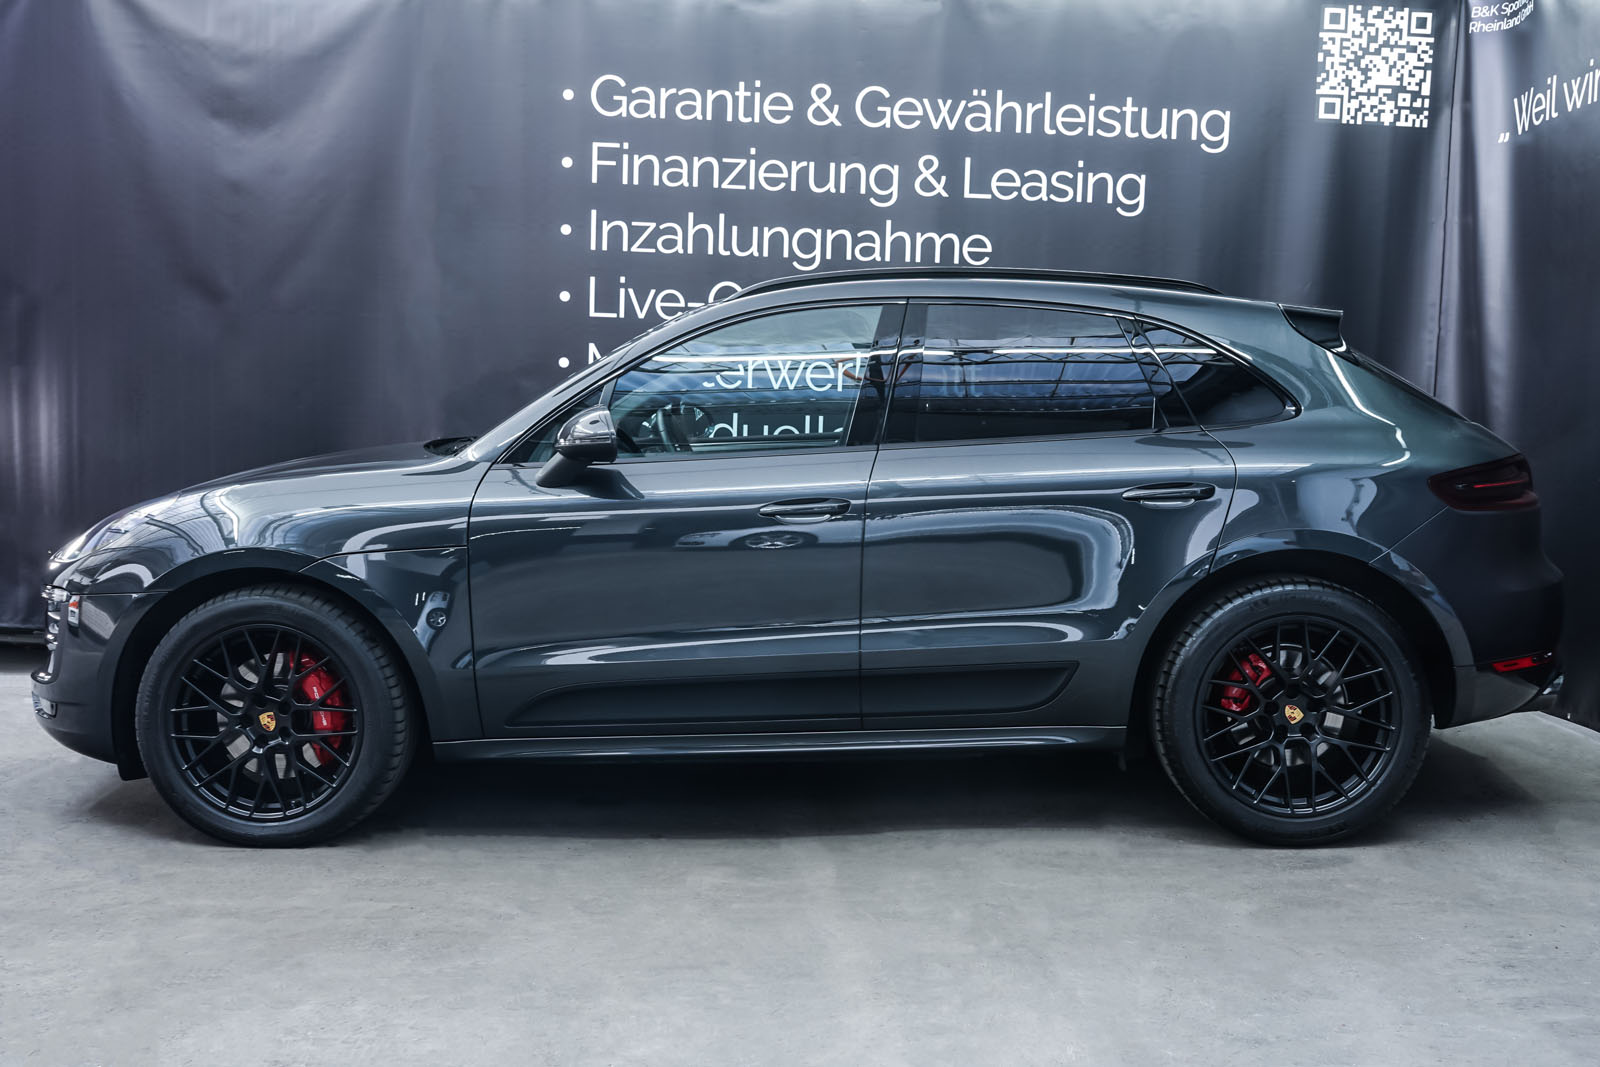 Porsche_Macan_GTS_Dunkelgrau_Schwarz_POR-8174_5_w